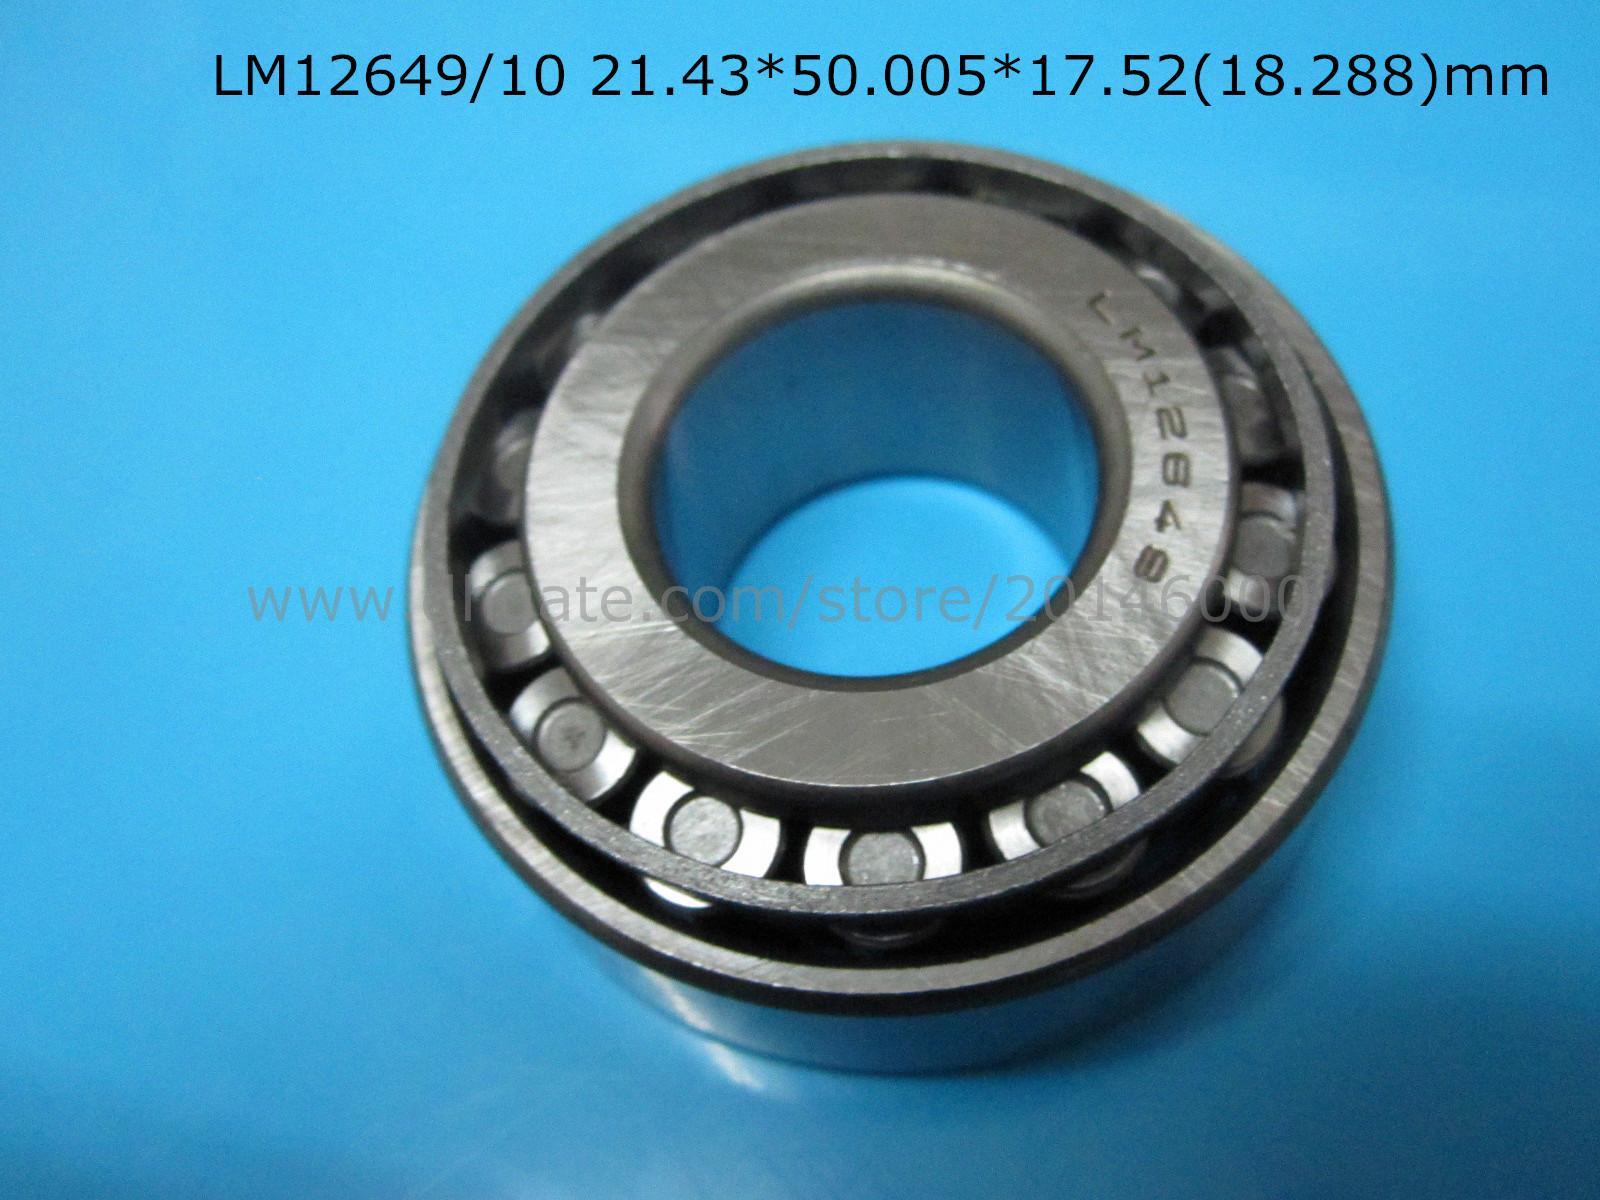 12649 LM12649/10 подшипников сплющенного ролика LM12649/10 21.43*50.005*17.5218.288мм